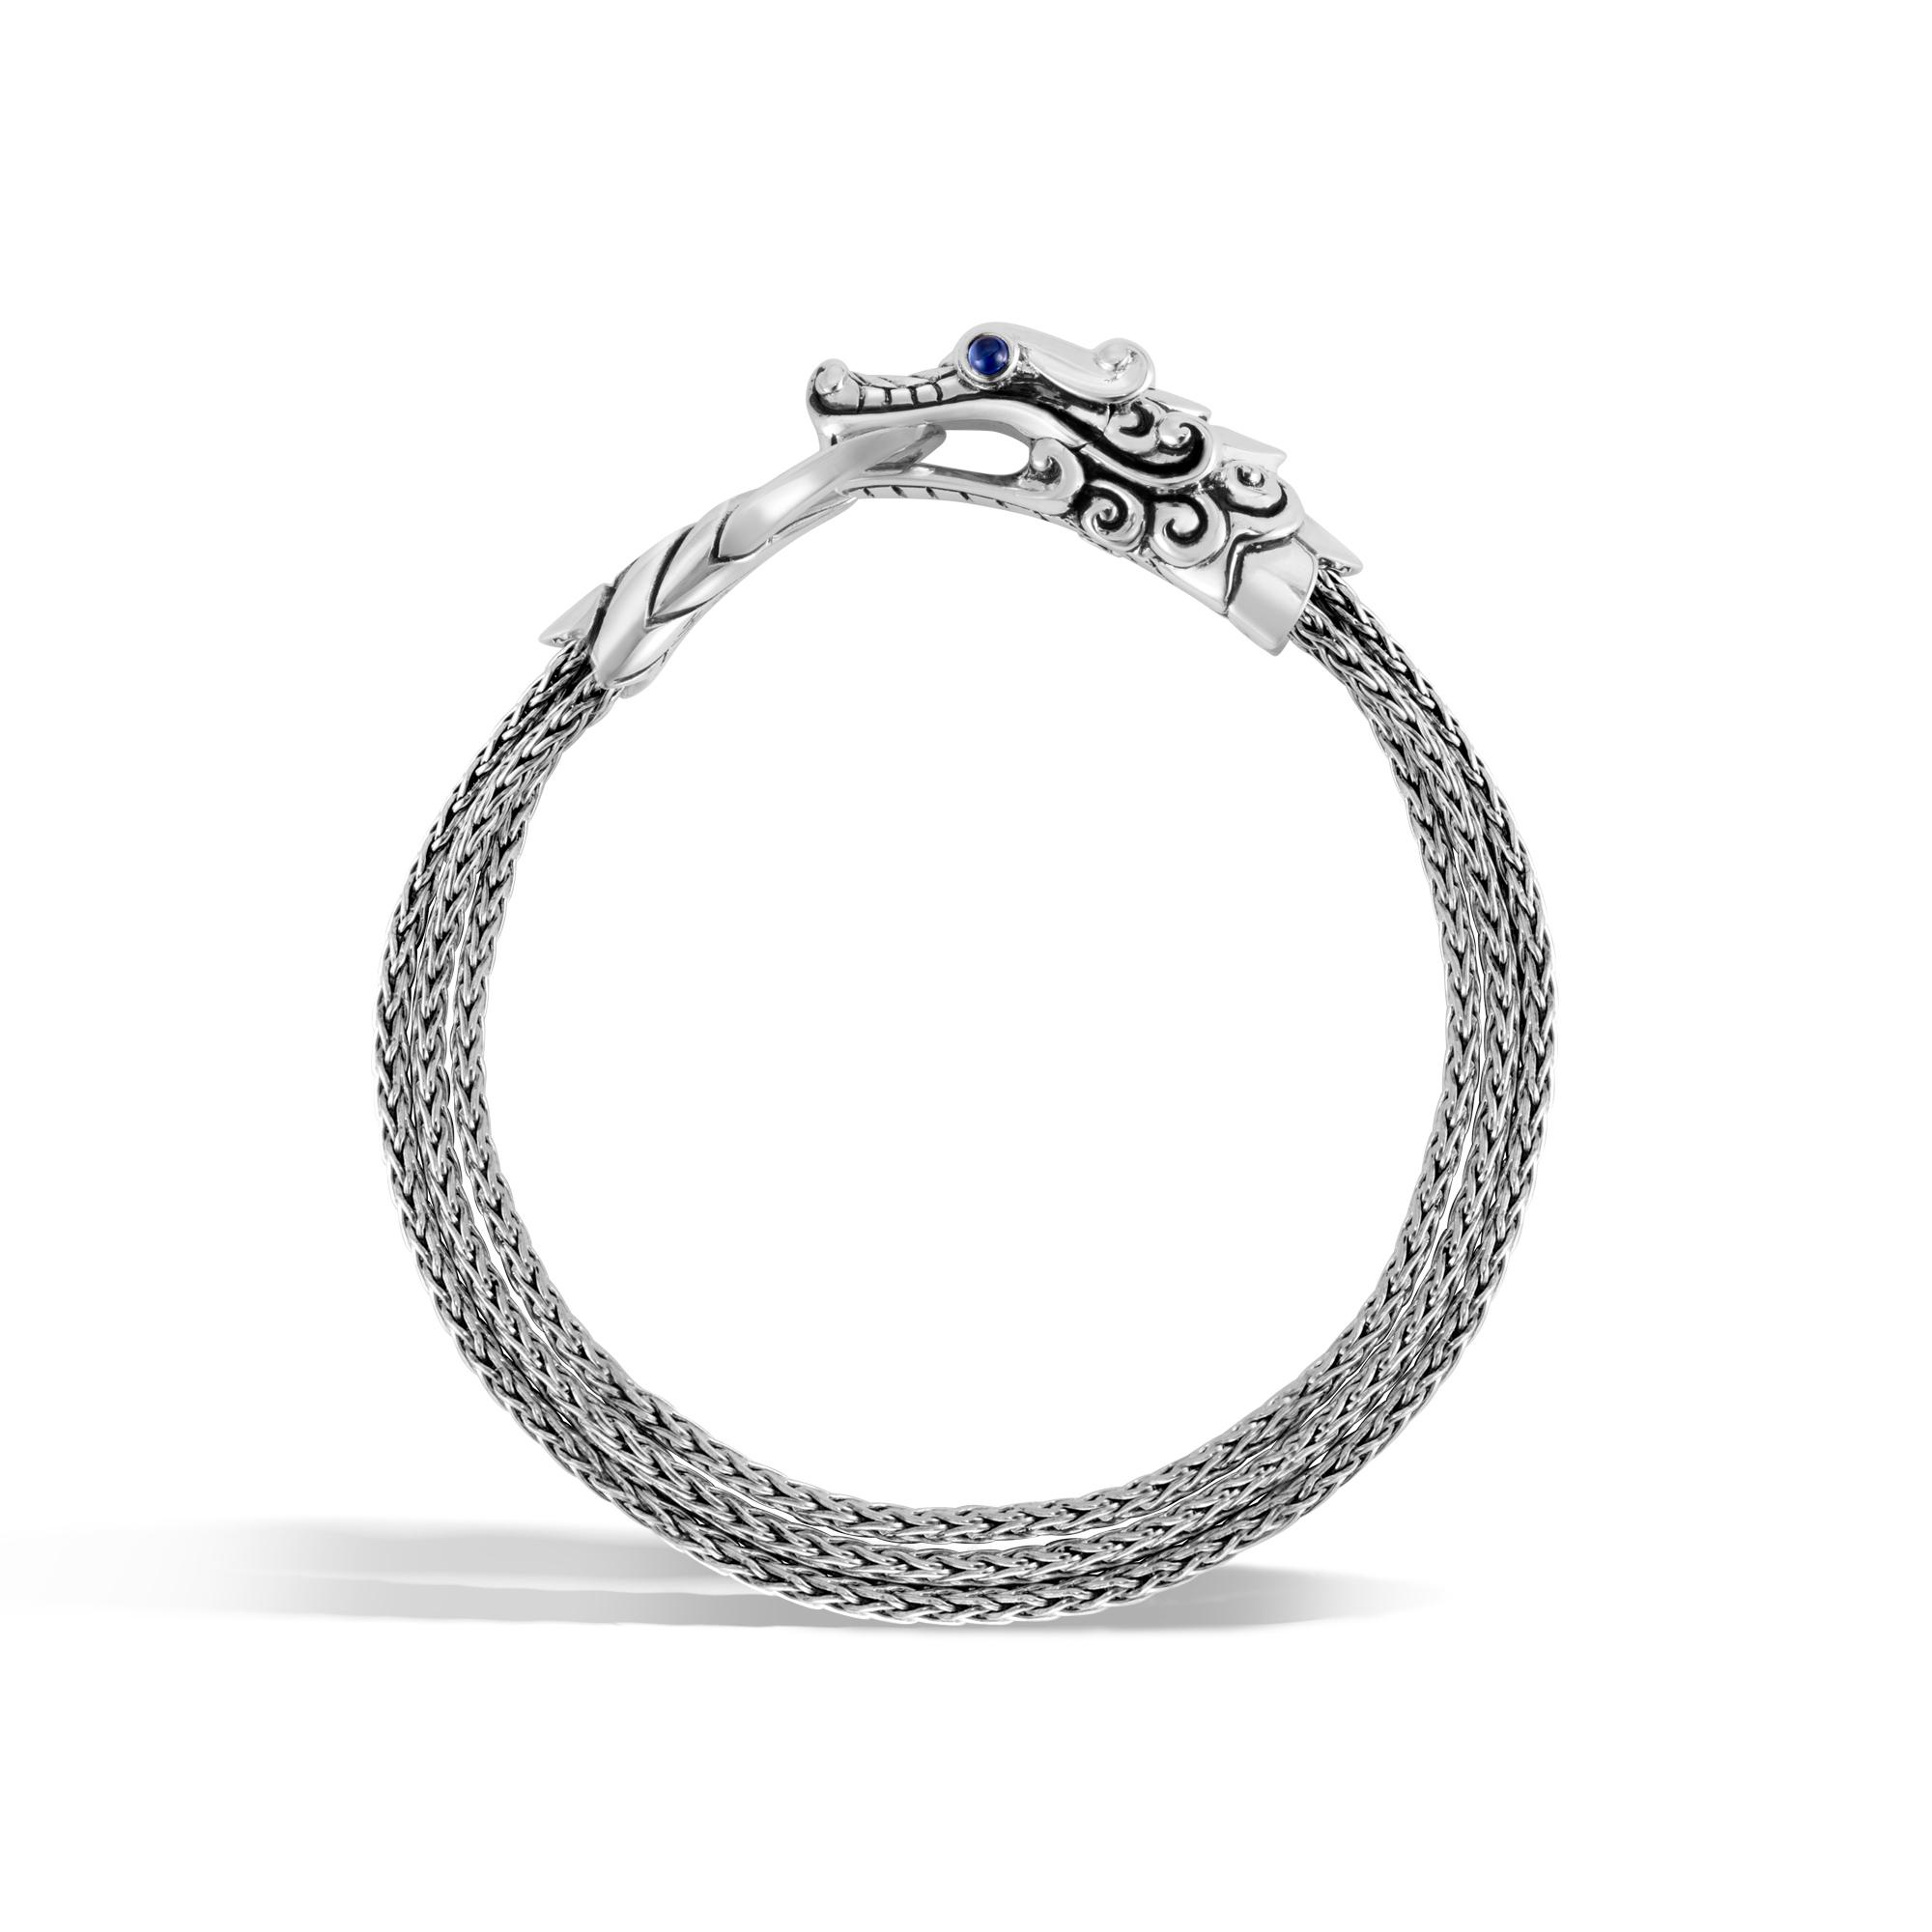 Legends Naga Multi Row Bracelet in Silver, Blue Sapphire, large